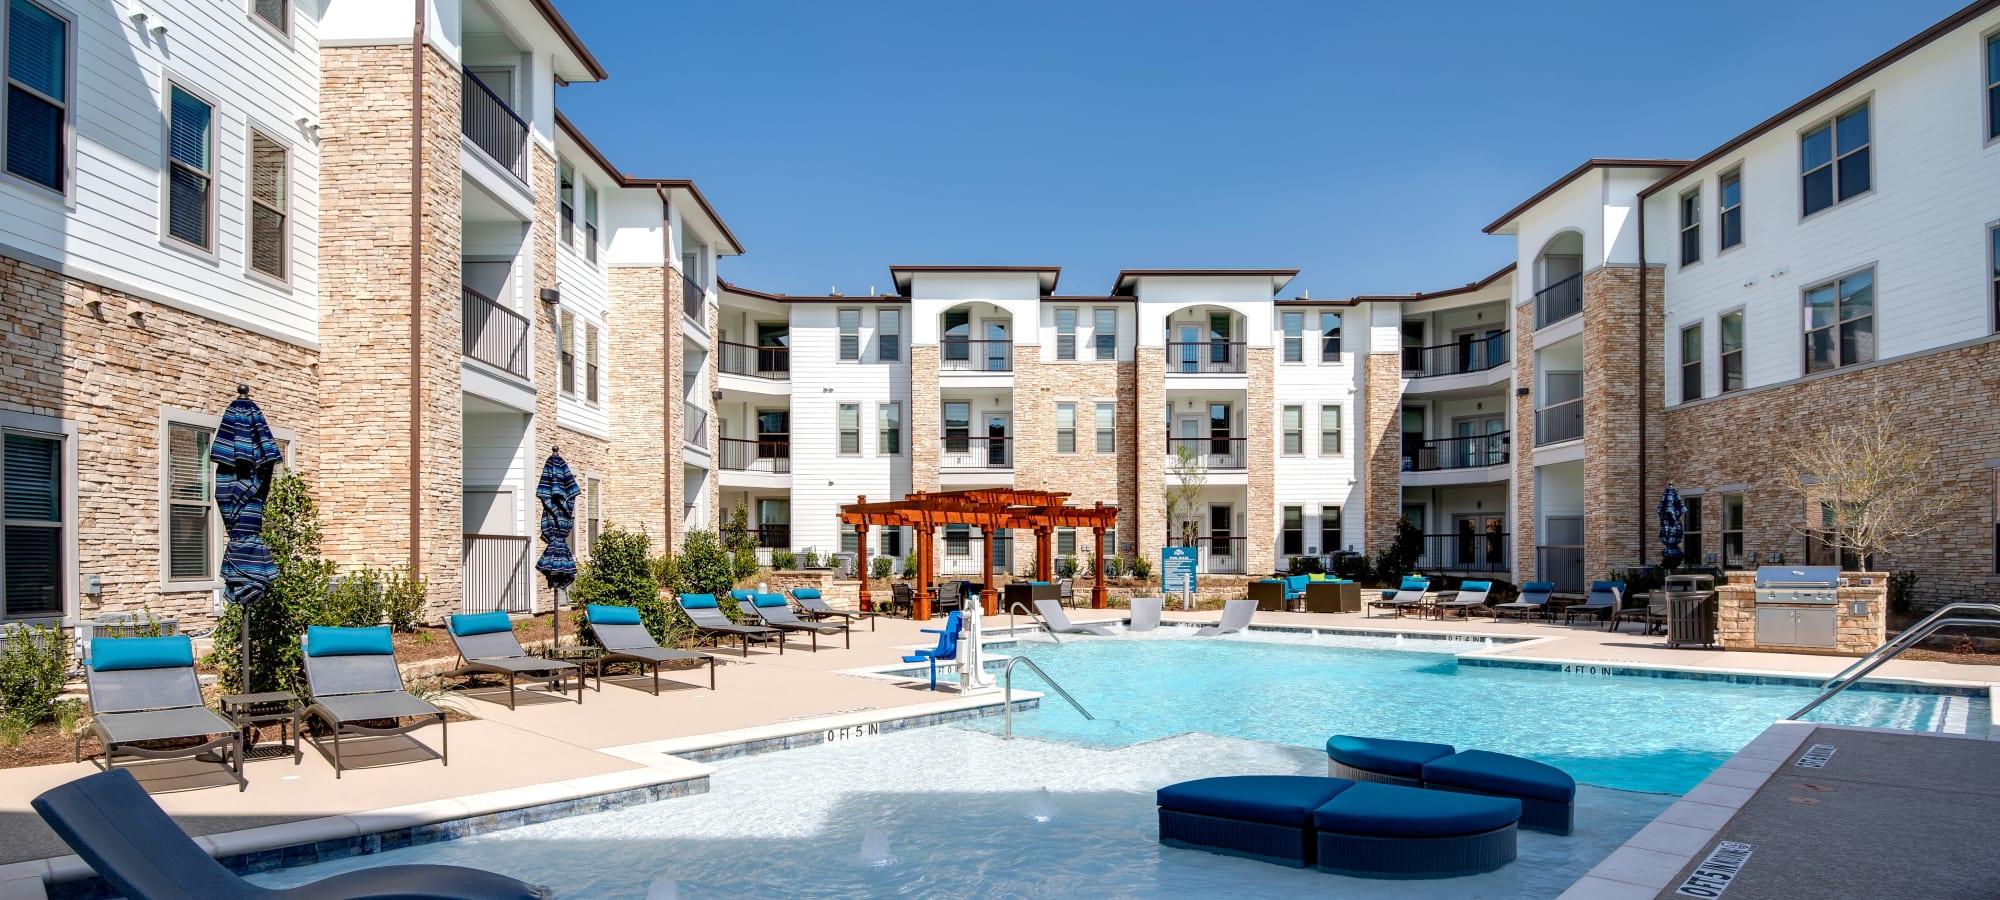 Resort style pool at Bellrock Upper North in Haltom City, Texas